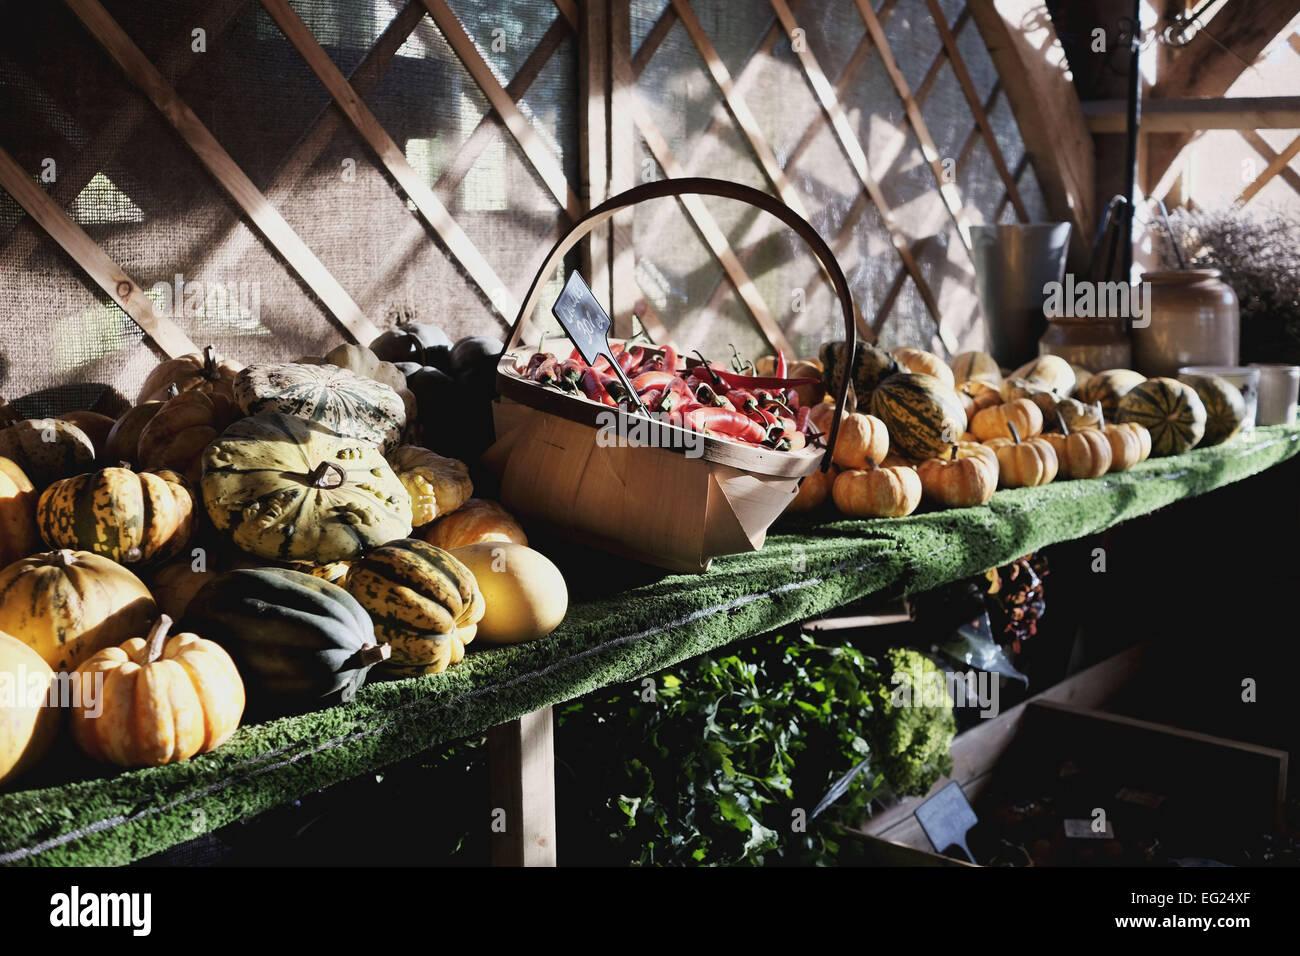 greengrocer,green,greengrocery,market,supermarket,supermarket shopping,supermarket shopping,supermarket shelves,food,shopping, - Stock Image